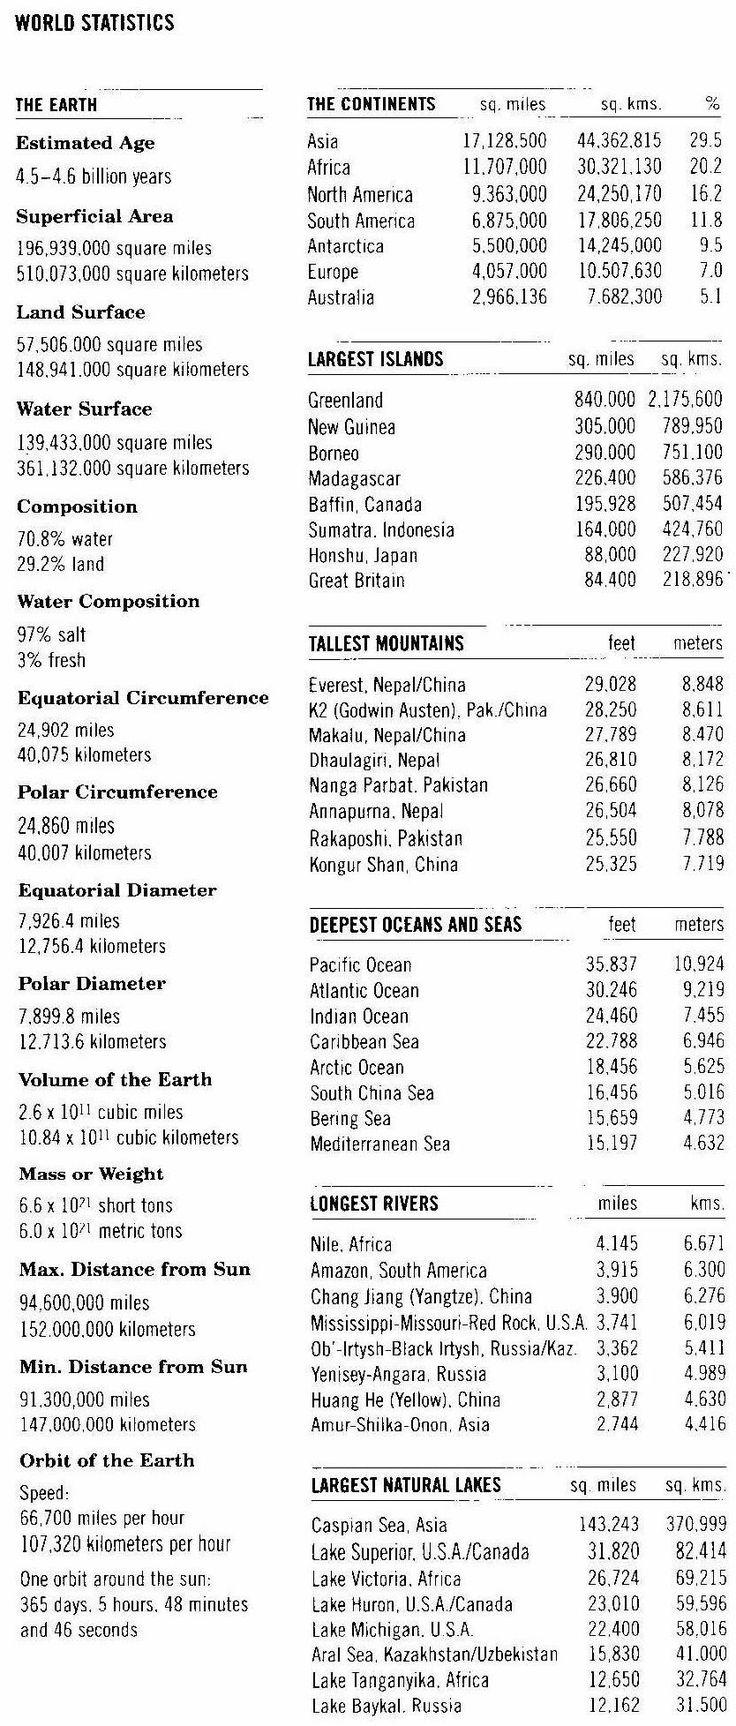 121 best handy data charts pormula images on pinterest sacred data charts statistics magnets anchor mathematics engineering infographics symbols knowledge buycottarizona Image collections